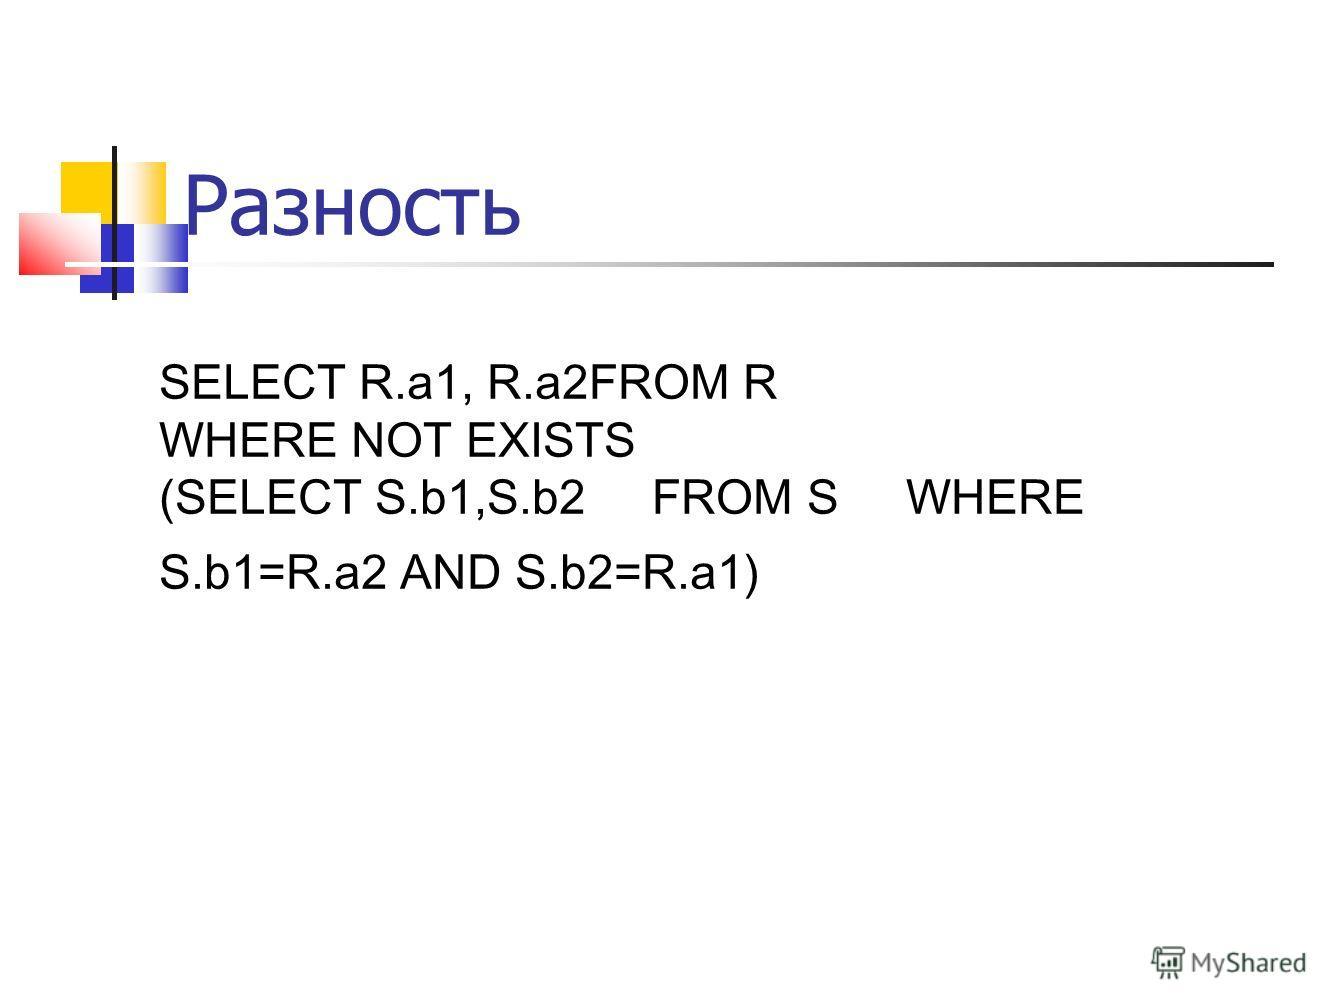 Разность SELECT R.a1, R.a2FROM R WHERE NOT EXISTS (SELECT S.b1,S.b2 FROM S WHERE S.b1=R.a2 AND S.b2=R.a1)